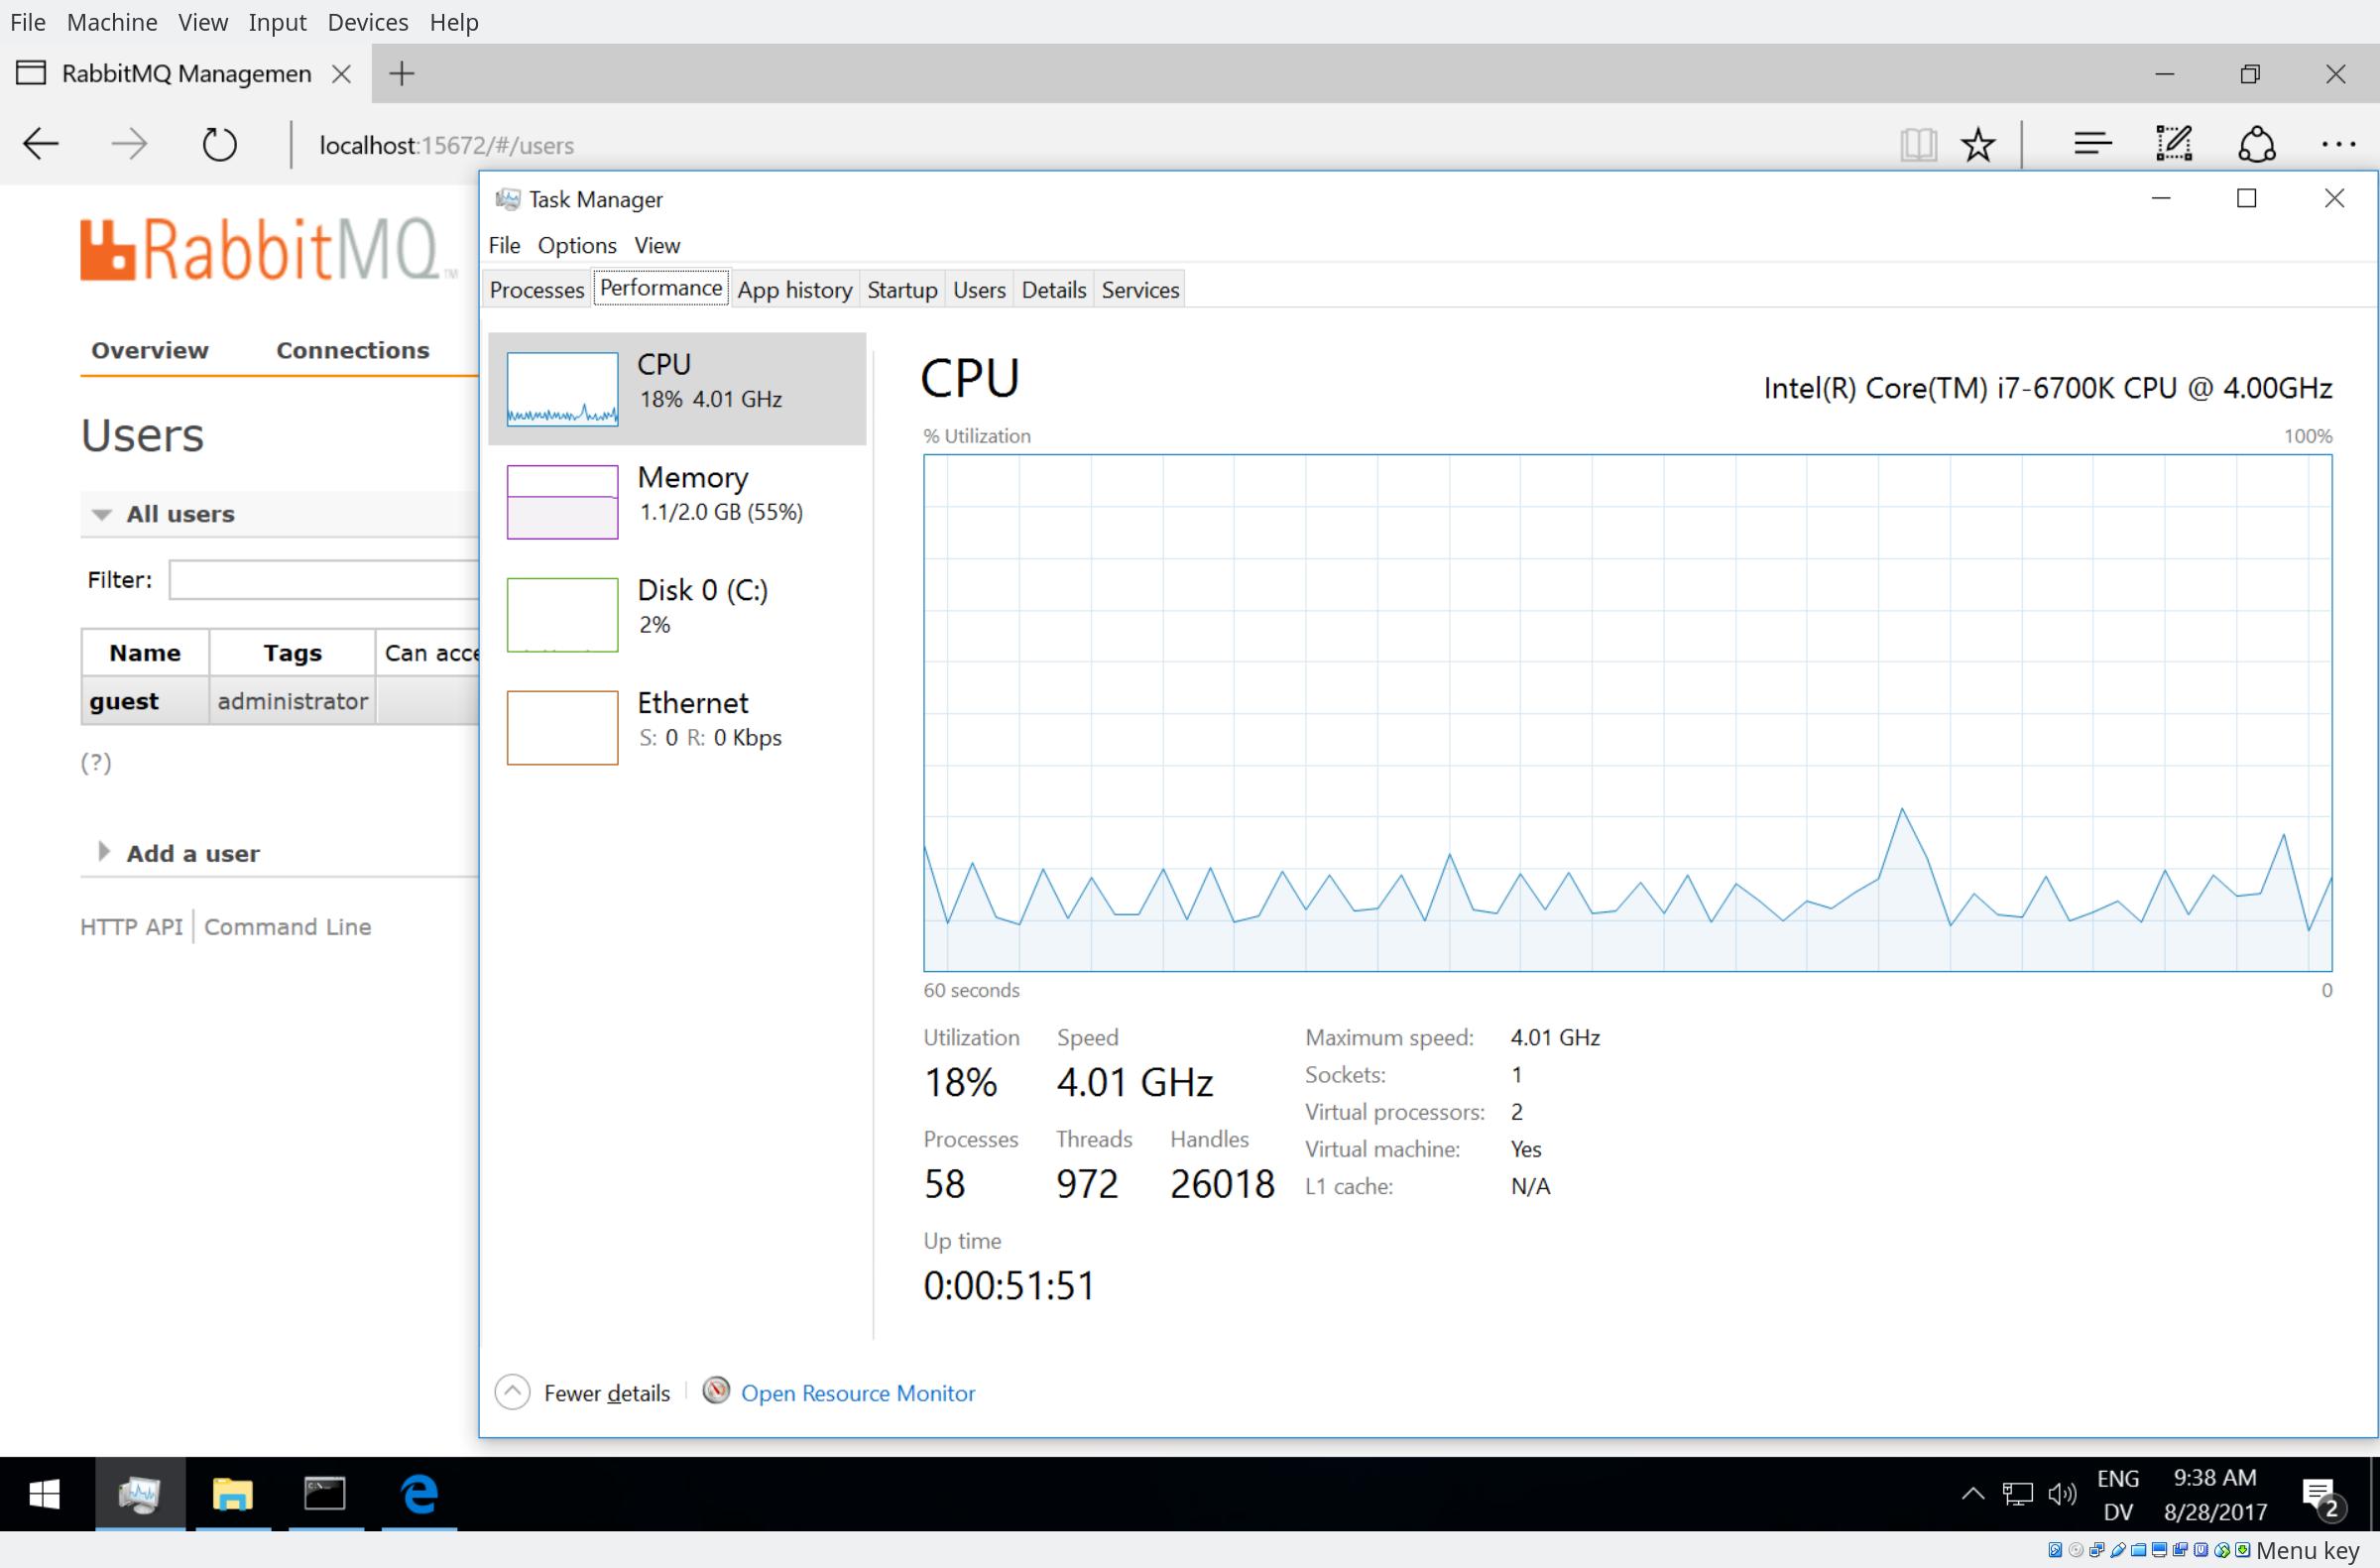 Windows: RabbitMQ spawns wmic periodically and wmiprvse